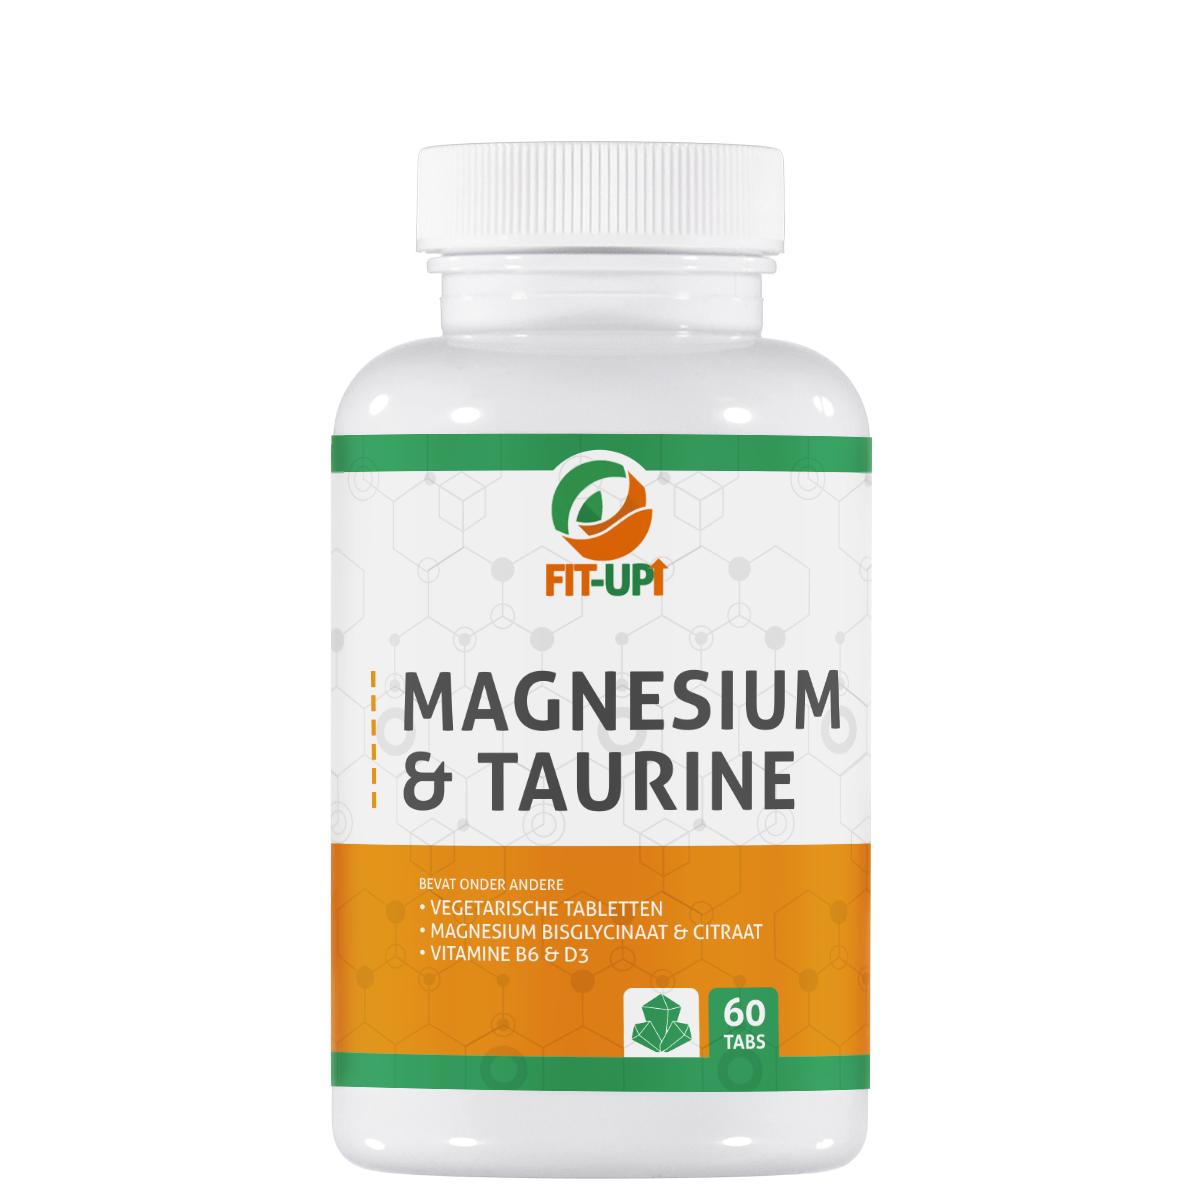 Magnesium & Taurine - 60 Tabletten